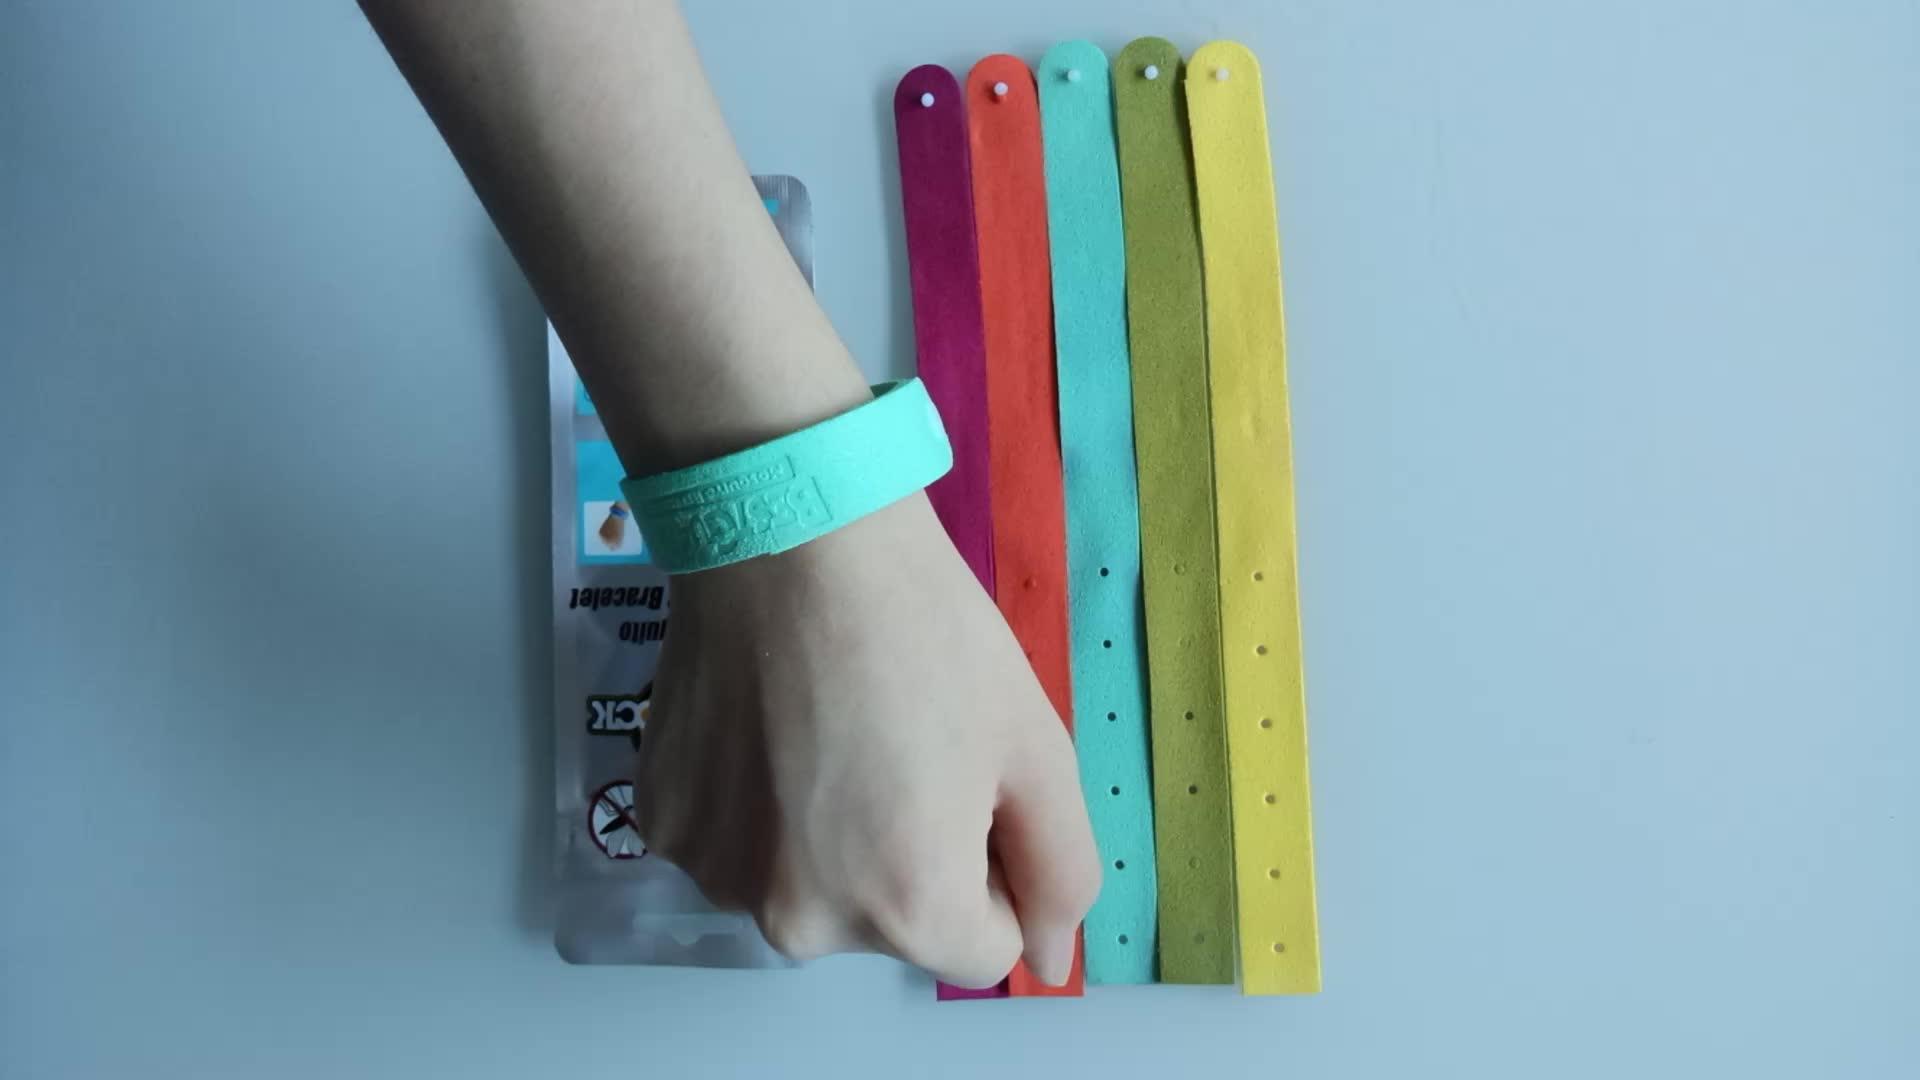 Anti Moskito Mozzie Insektenschutzmittel Handschlaufe Großhandel Repeller Armband Handgelenk Band Insektennetze Camping